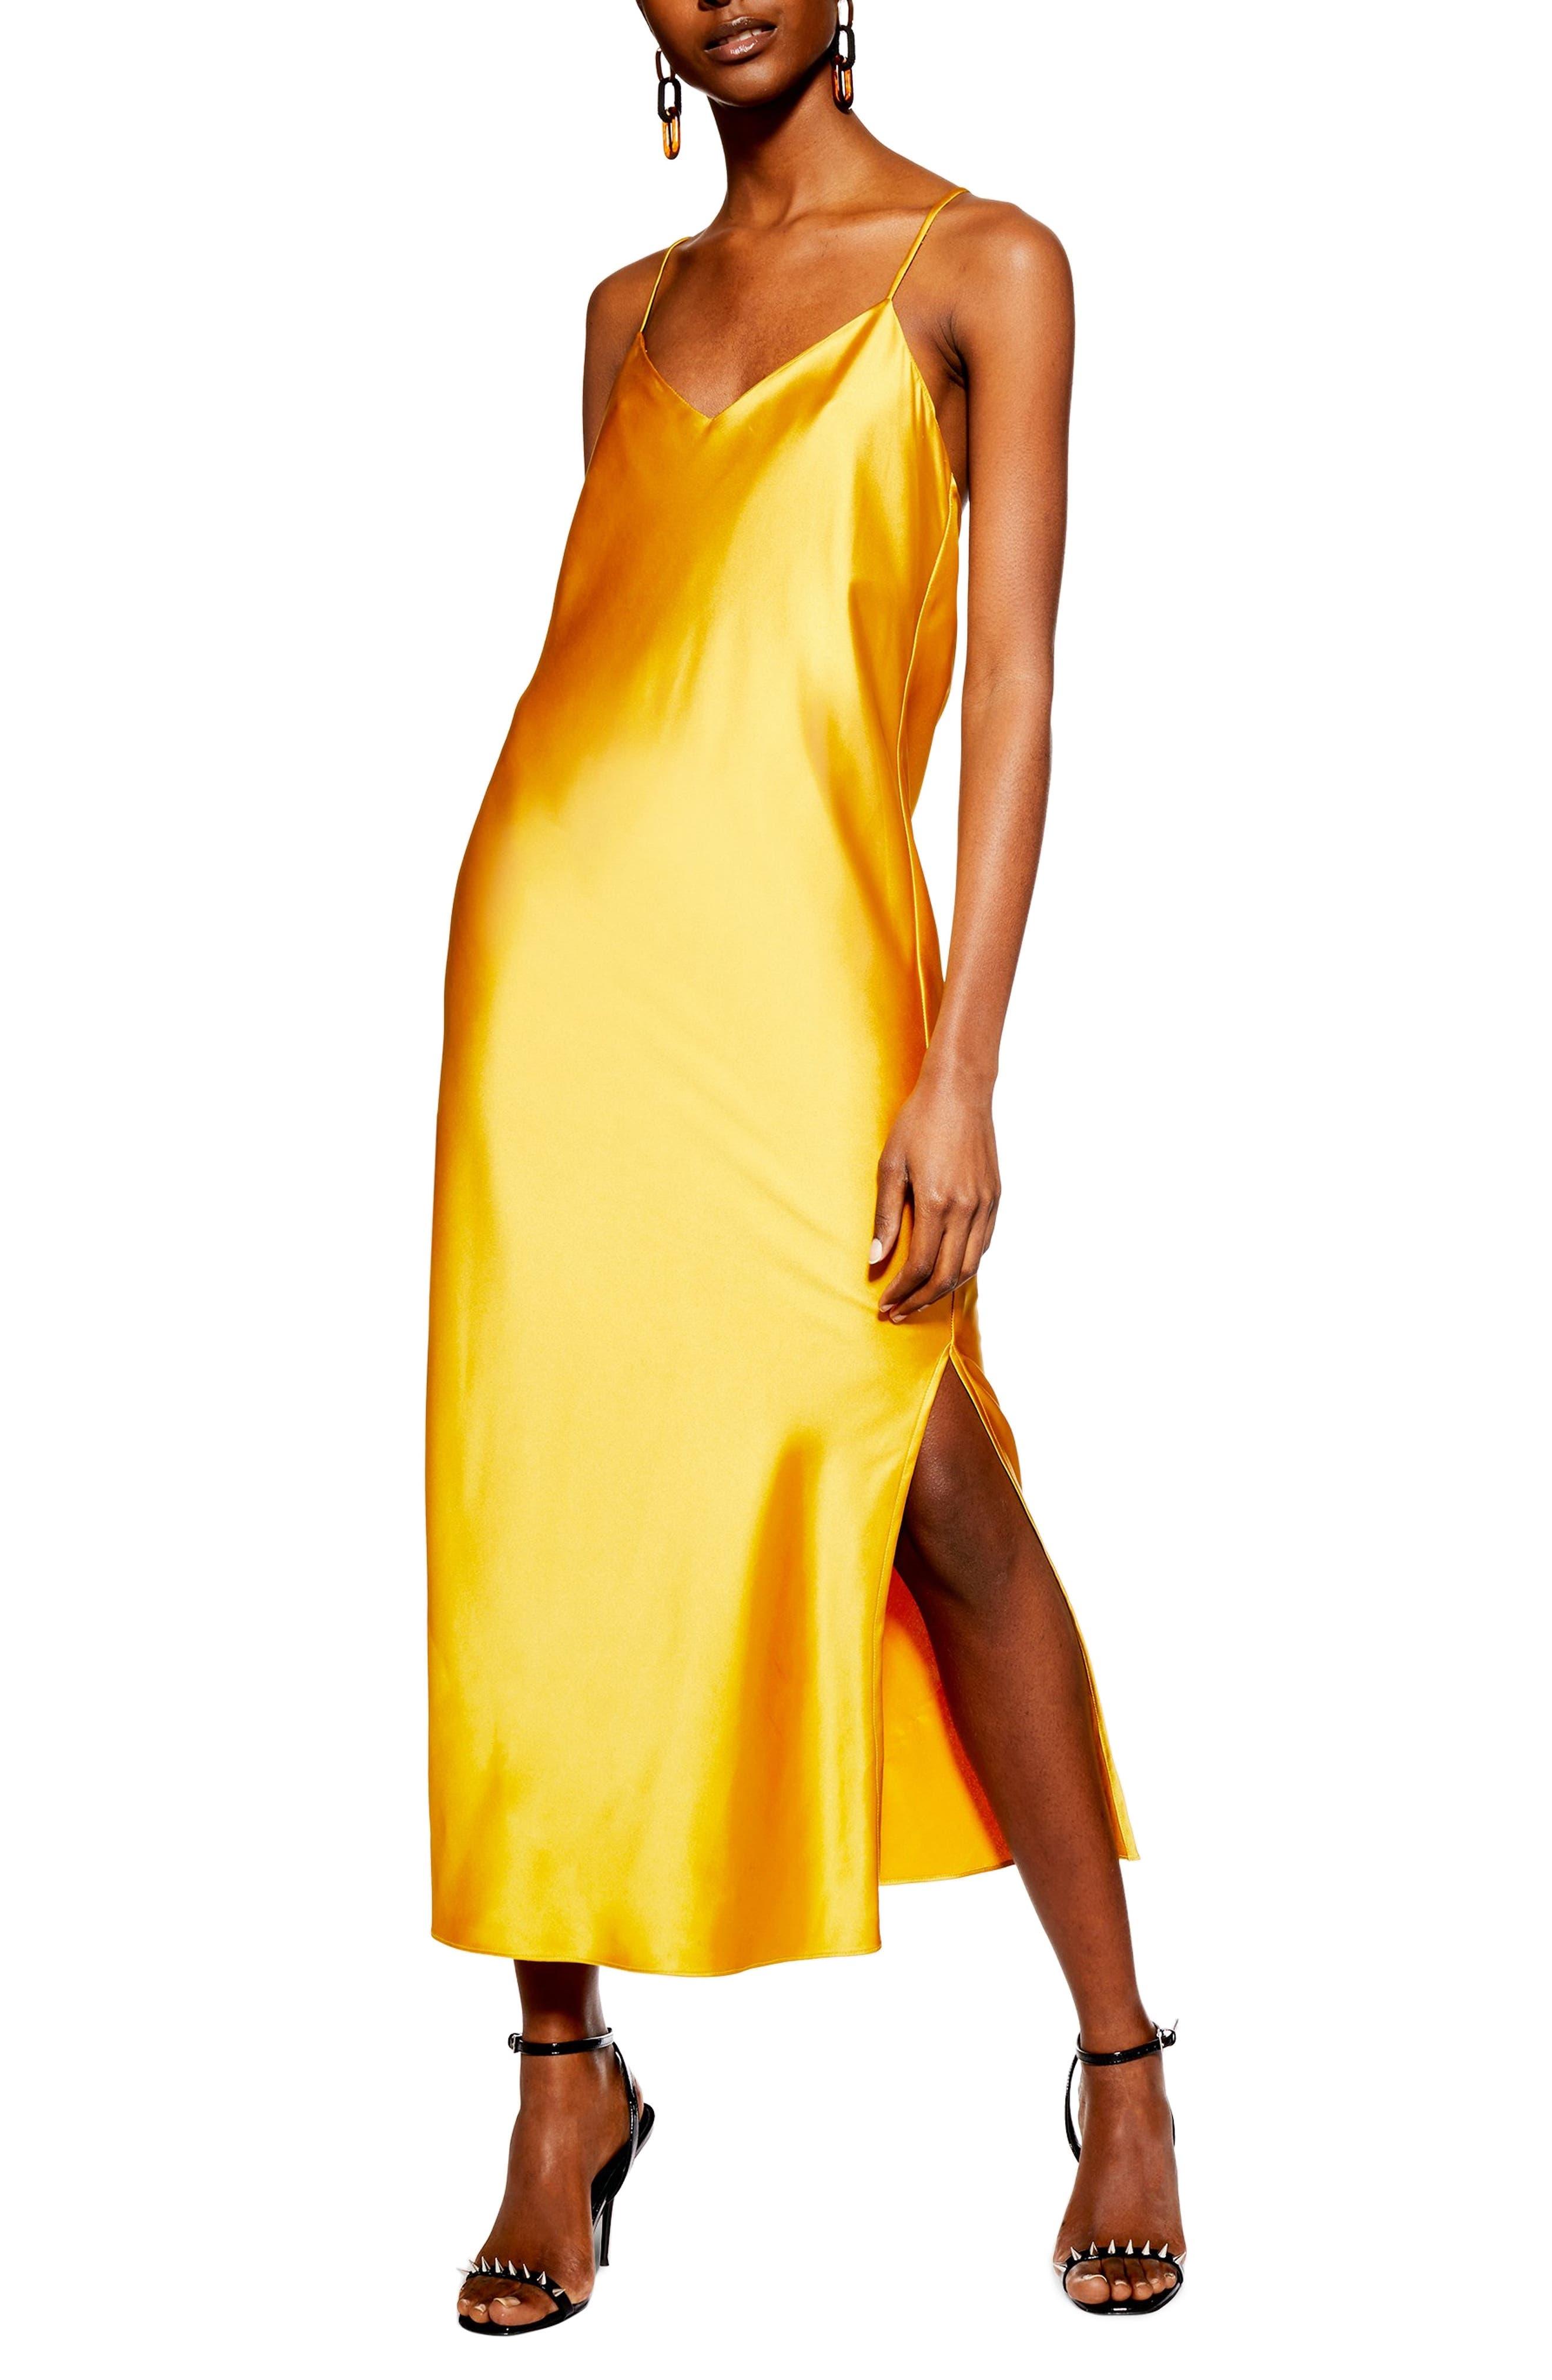 Topshop Plain Satin Slipdress, US (fits like 14) - Yellow